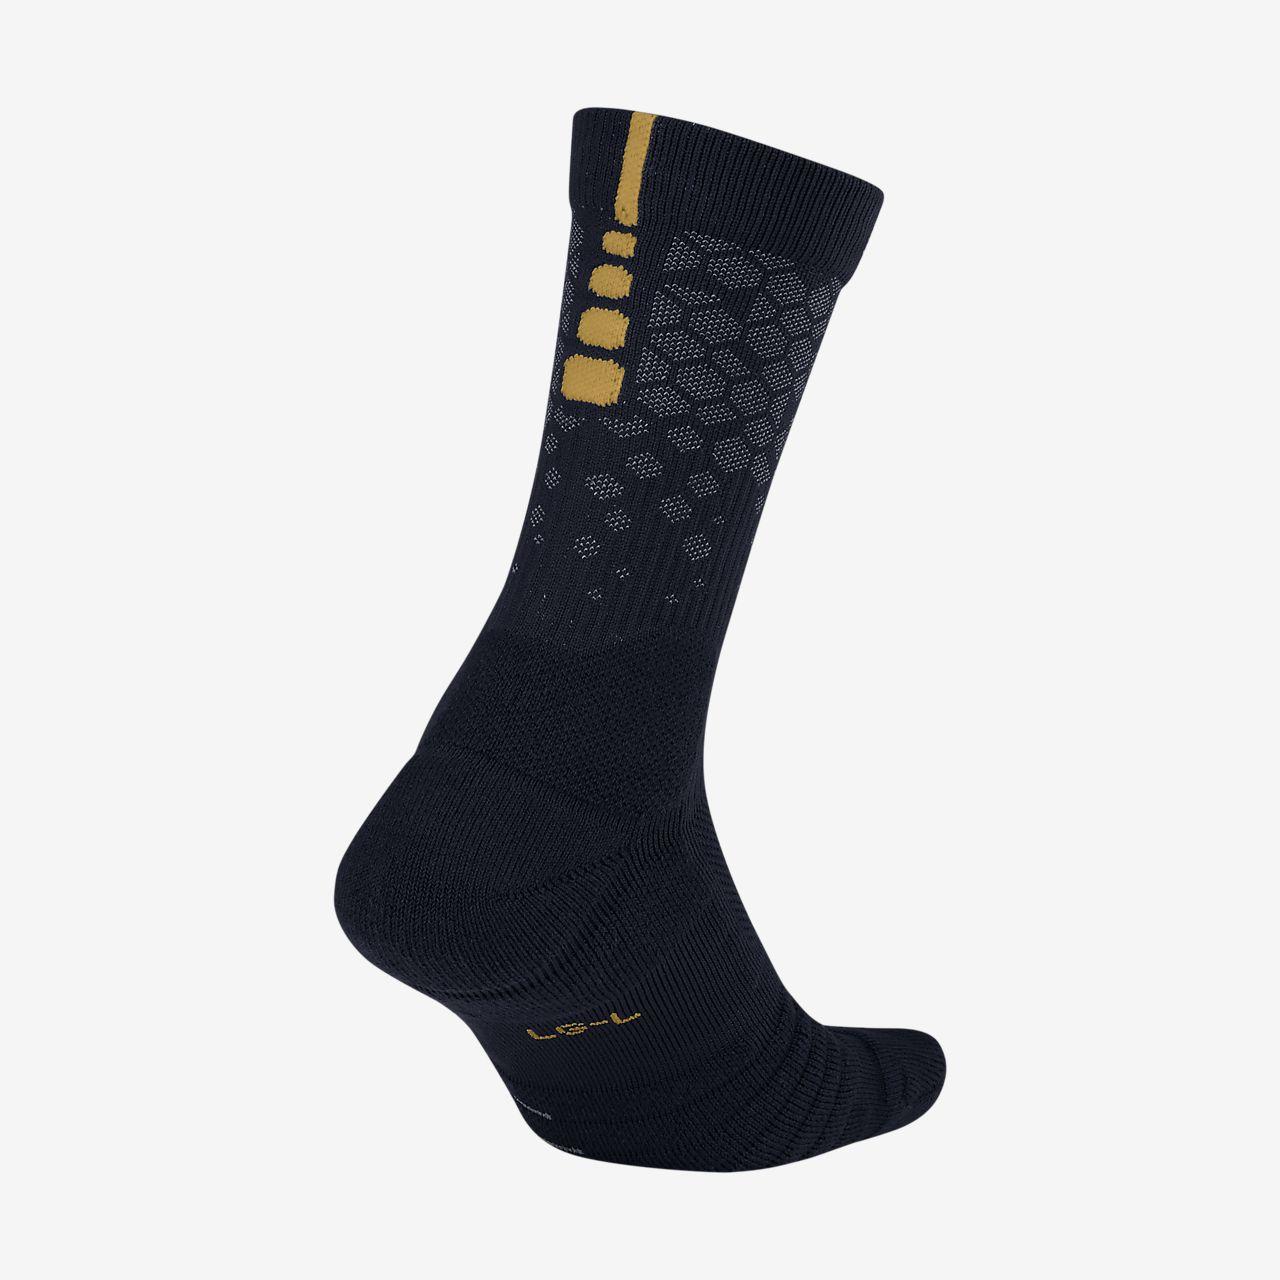 450d7c98ccd8 Nike Elite Quick PG Crew Basketball Socks. Nike.com CA